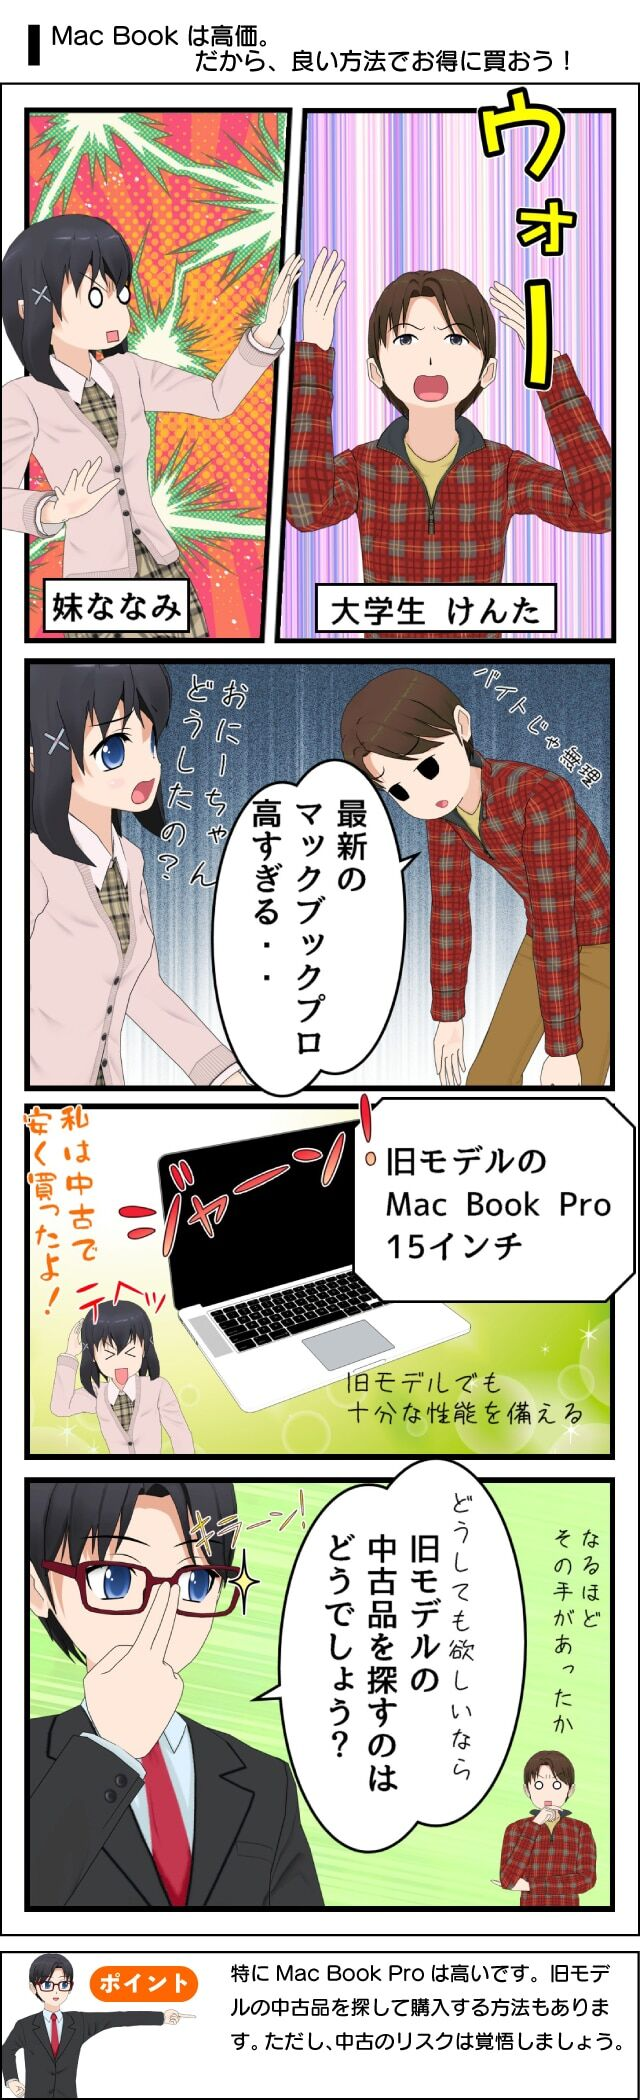 Macbookproは旧モデルでも十分な性能で、安く買えるよ